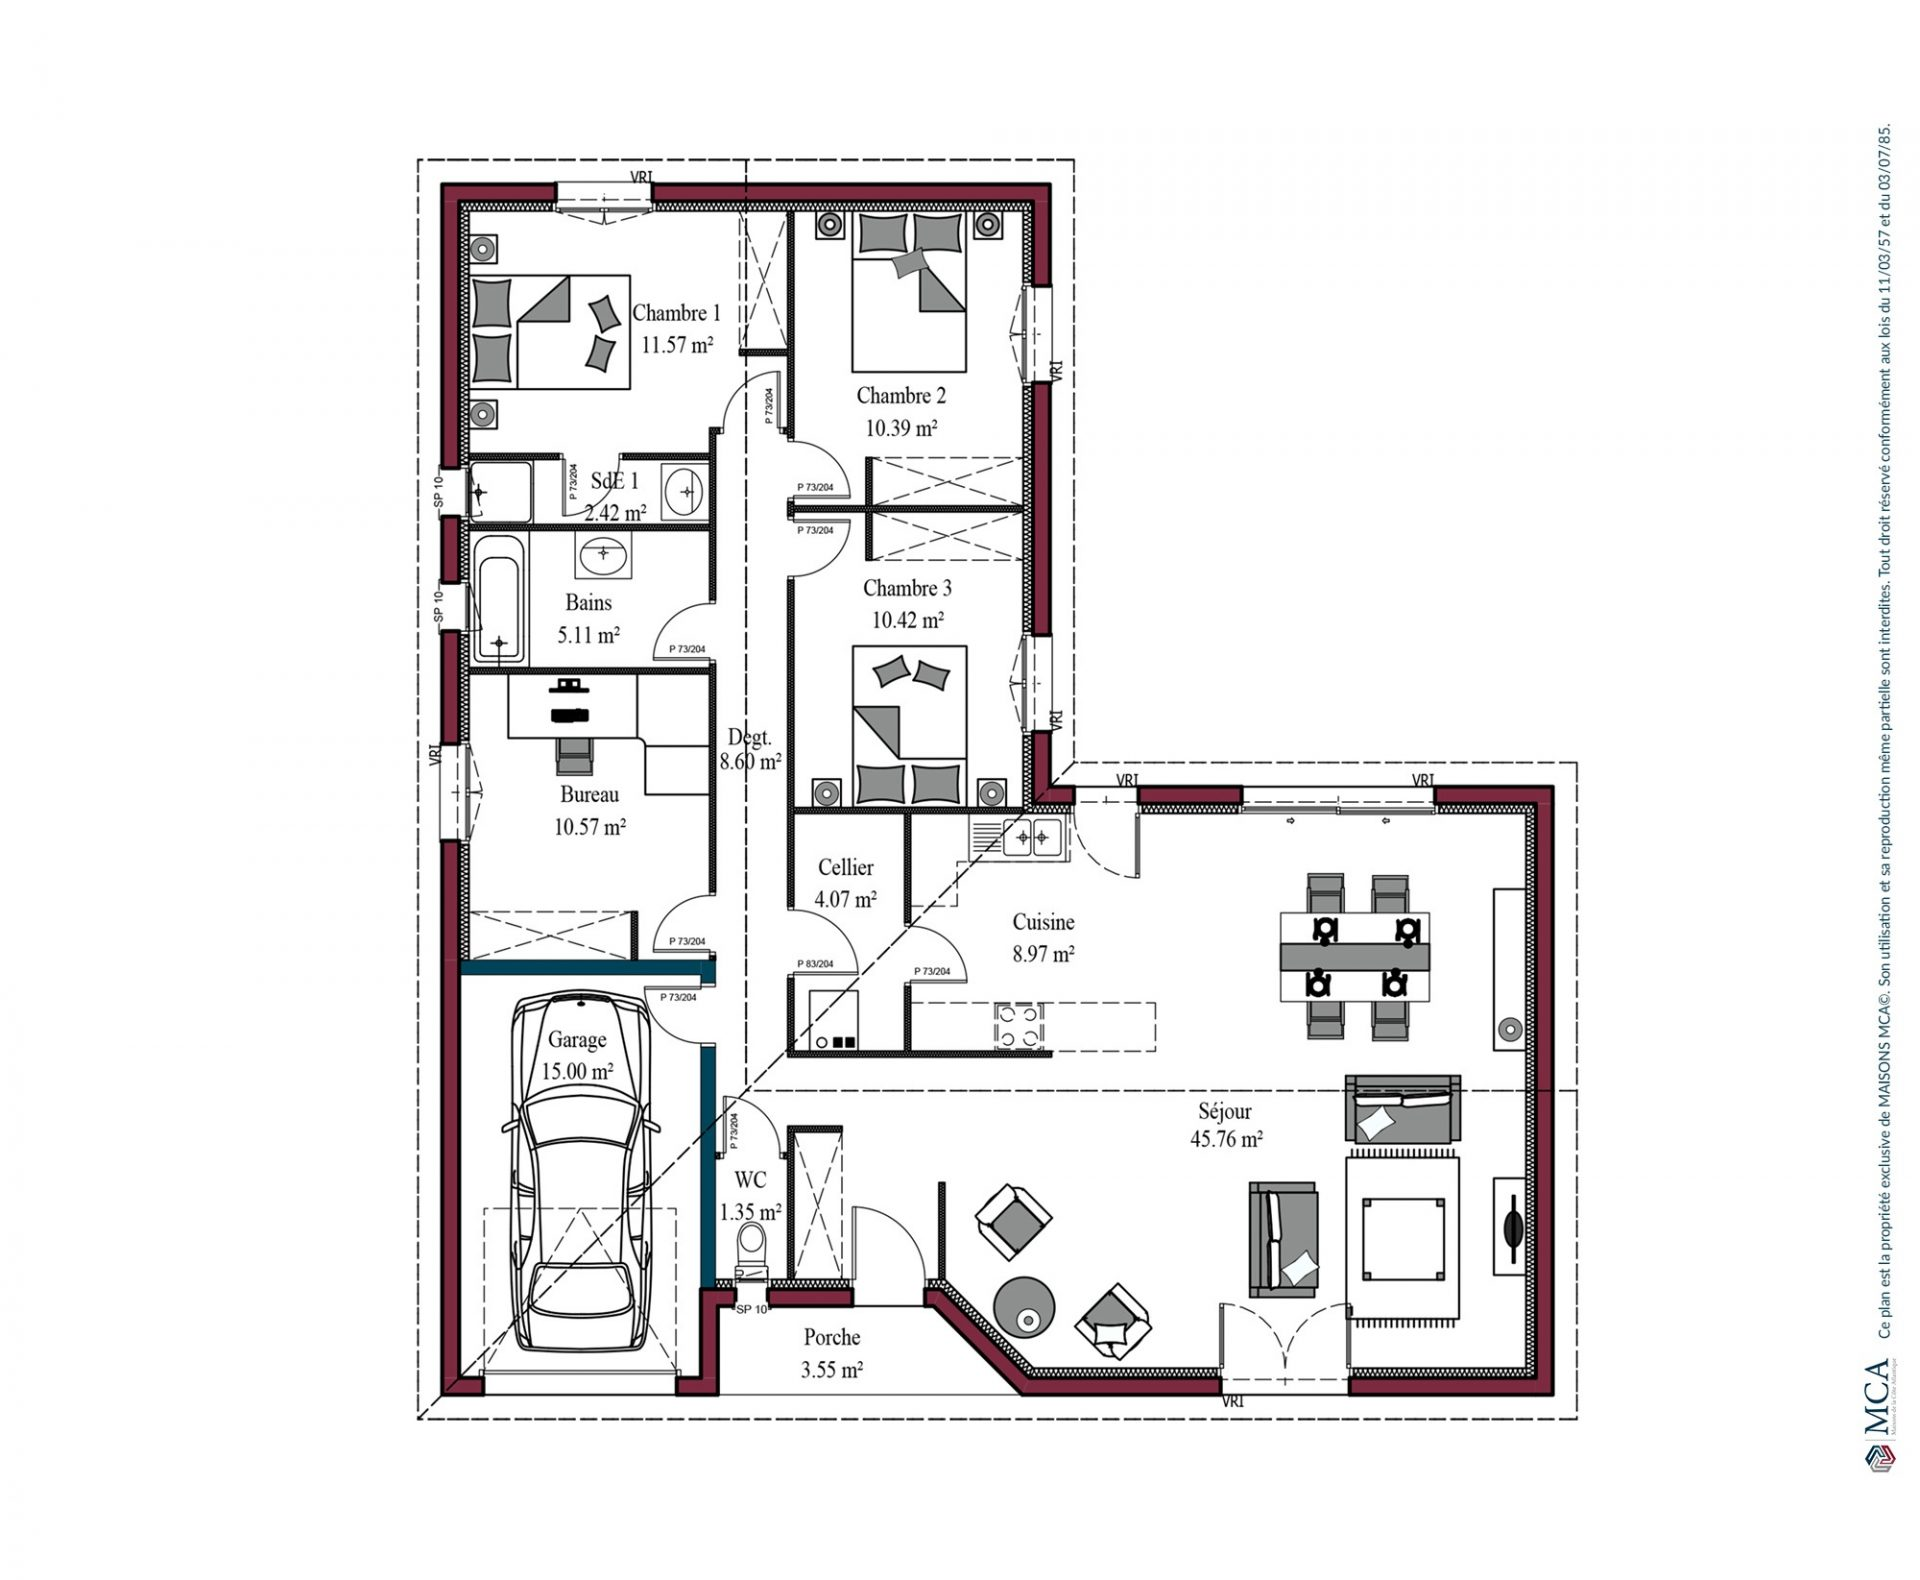 Plan Atlanta | 119 m²